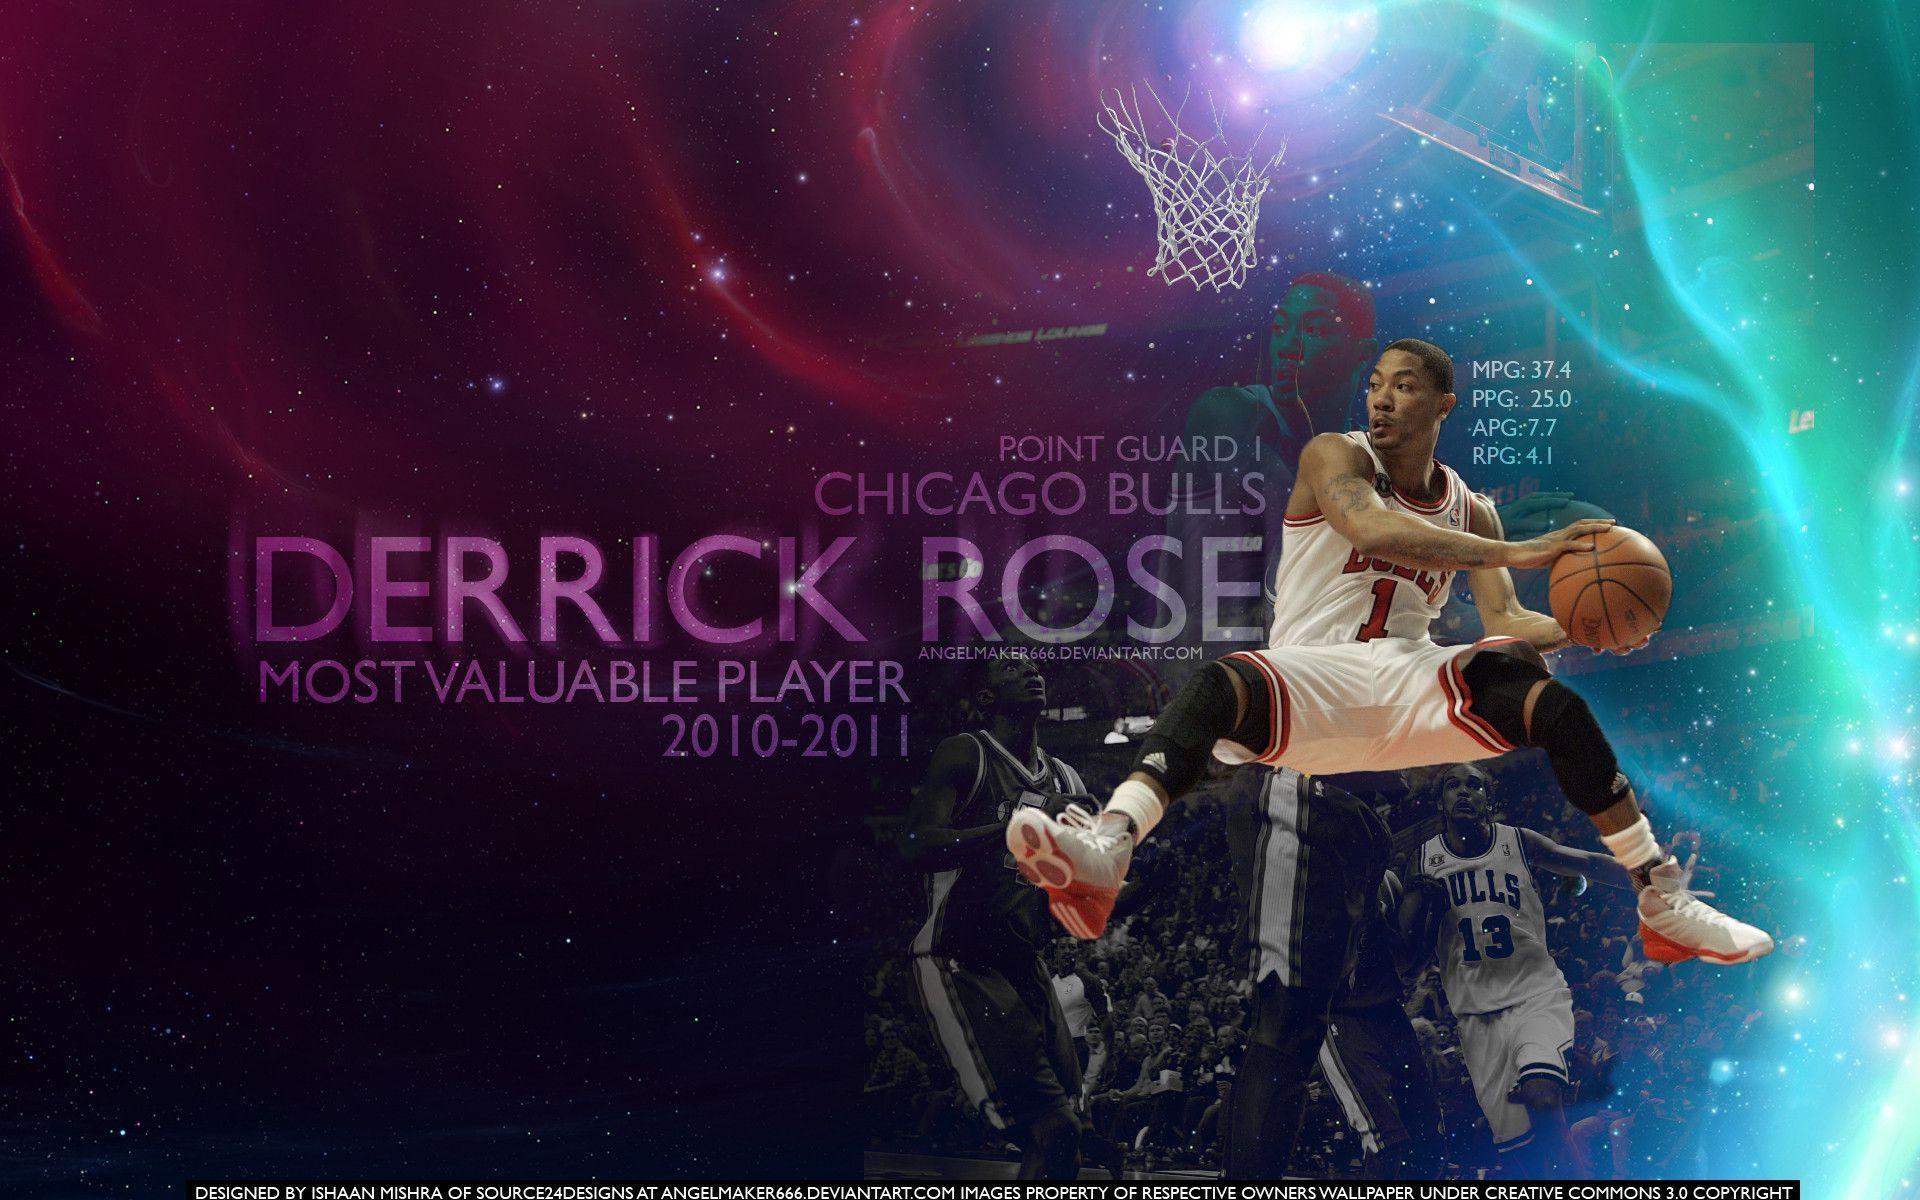 Derrick Rose Wallpaper Mvp Derrick Rose MV...